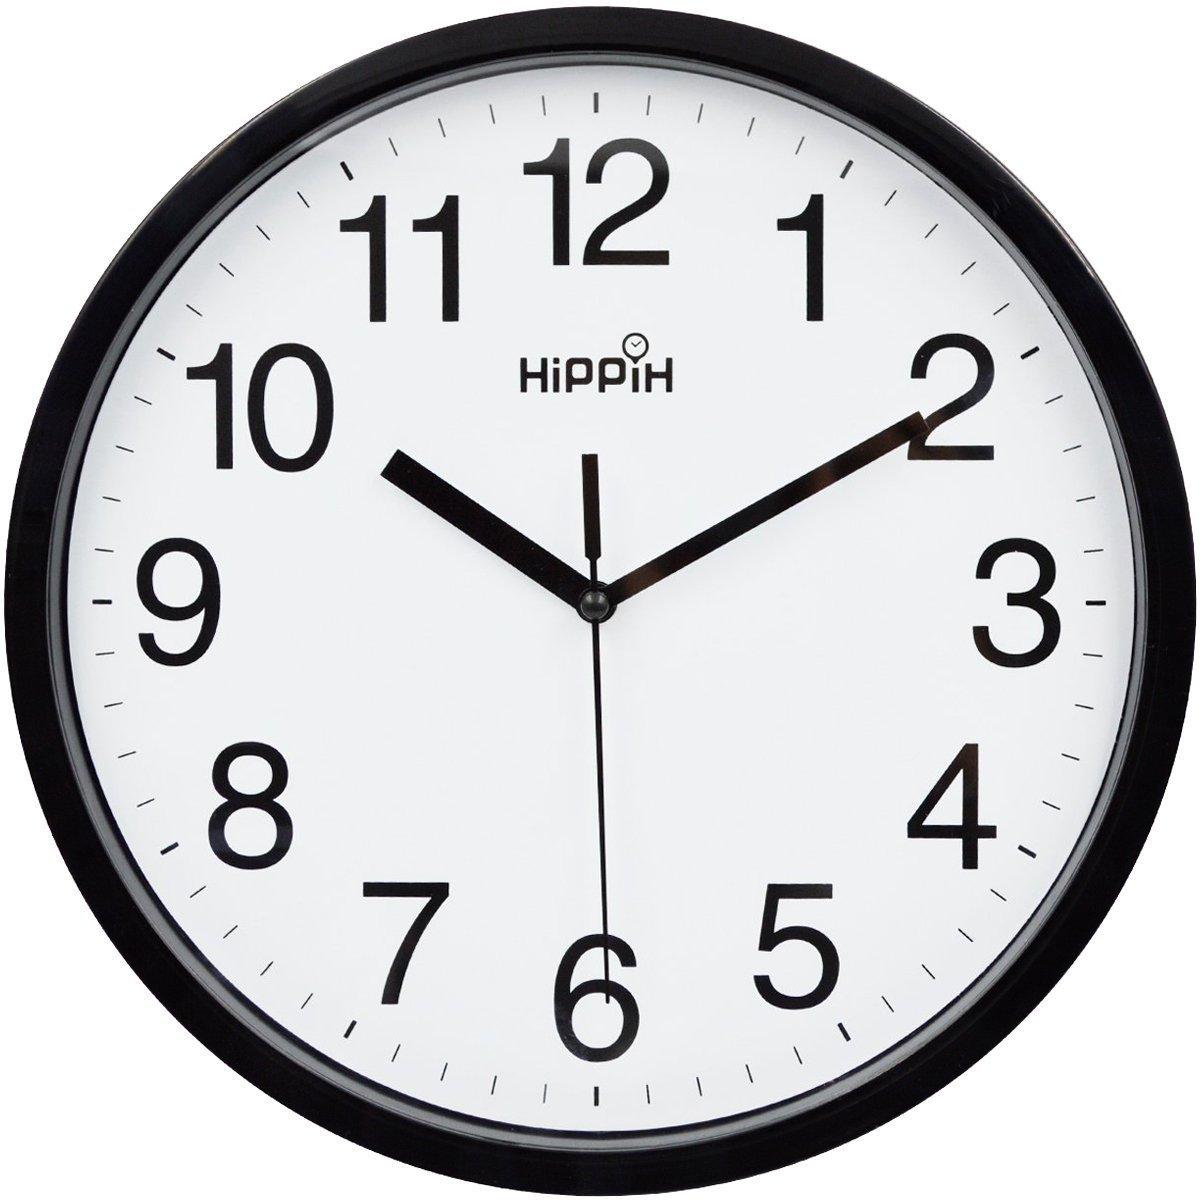 Hippih 10 Silent Quartz Decorative Wall Clock Non-ticking Digital(Black) by HIPPIH